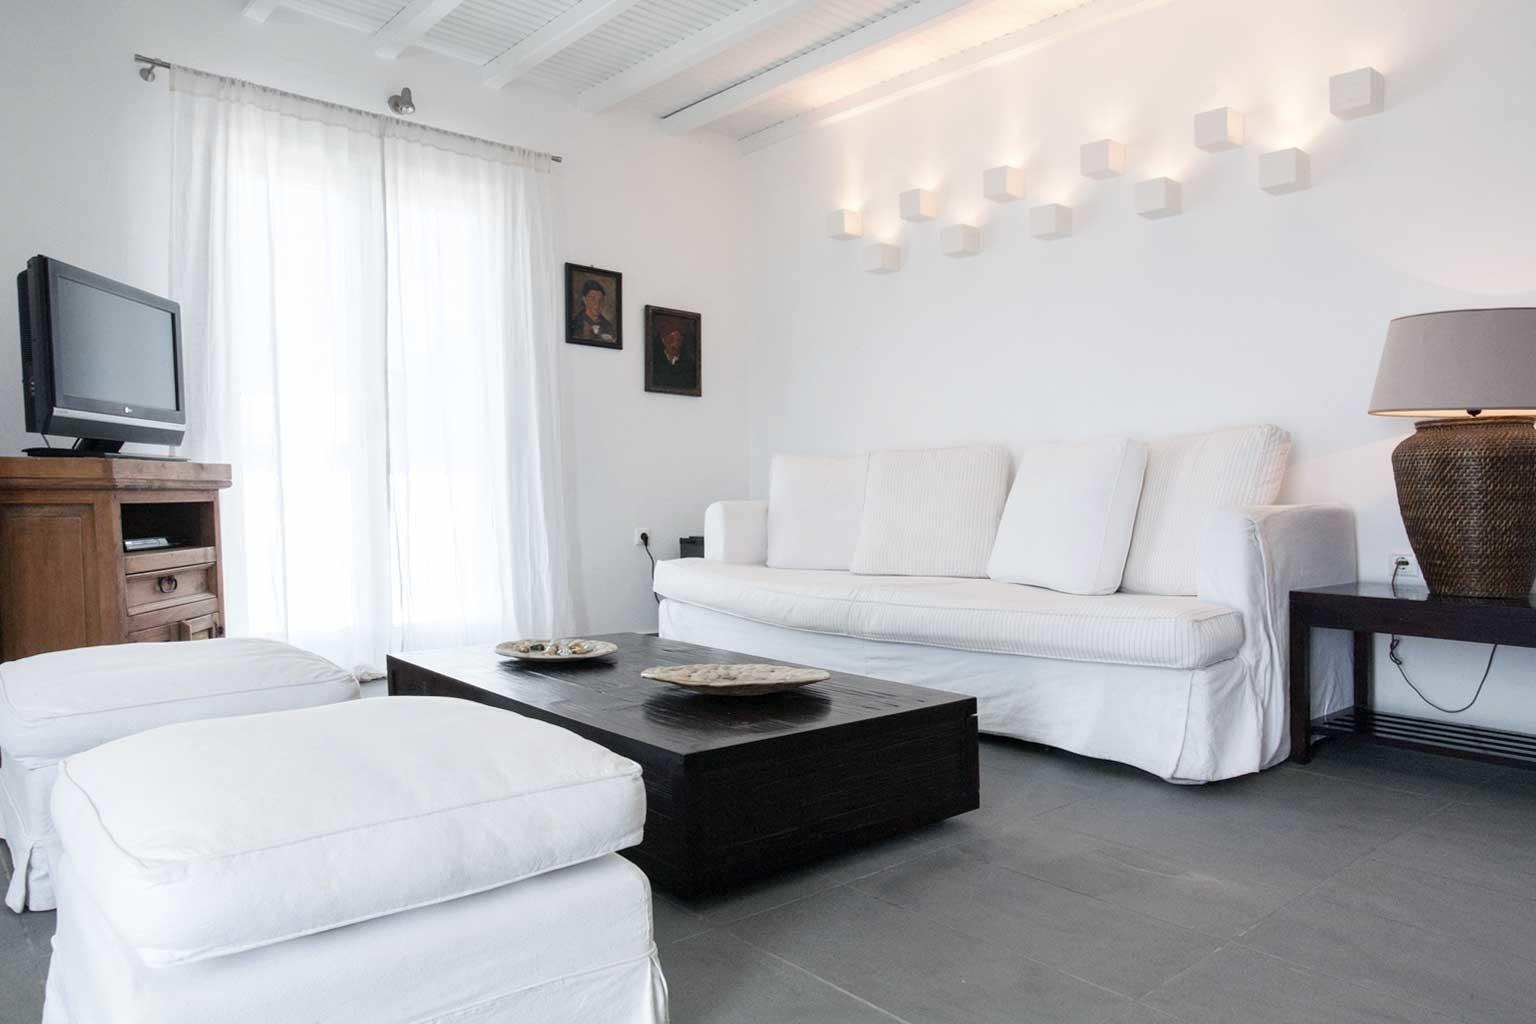 Lounge Luxury Modern sofa property living room Suite Bedroom condominium white home cottage Villa